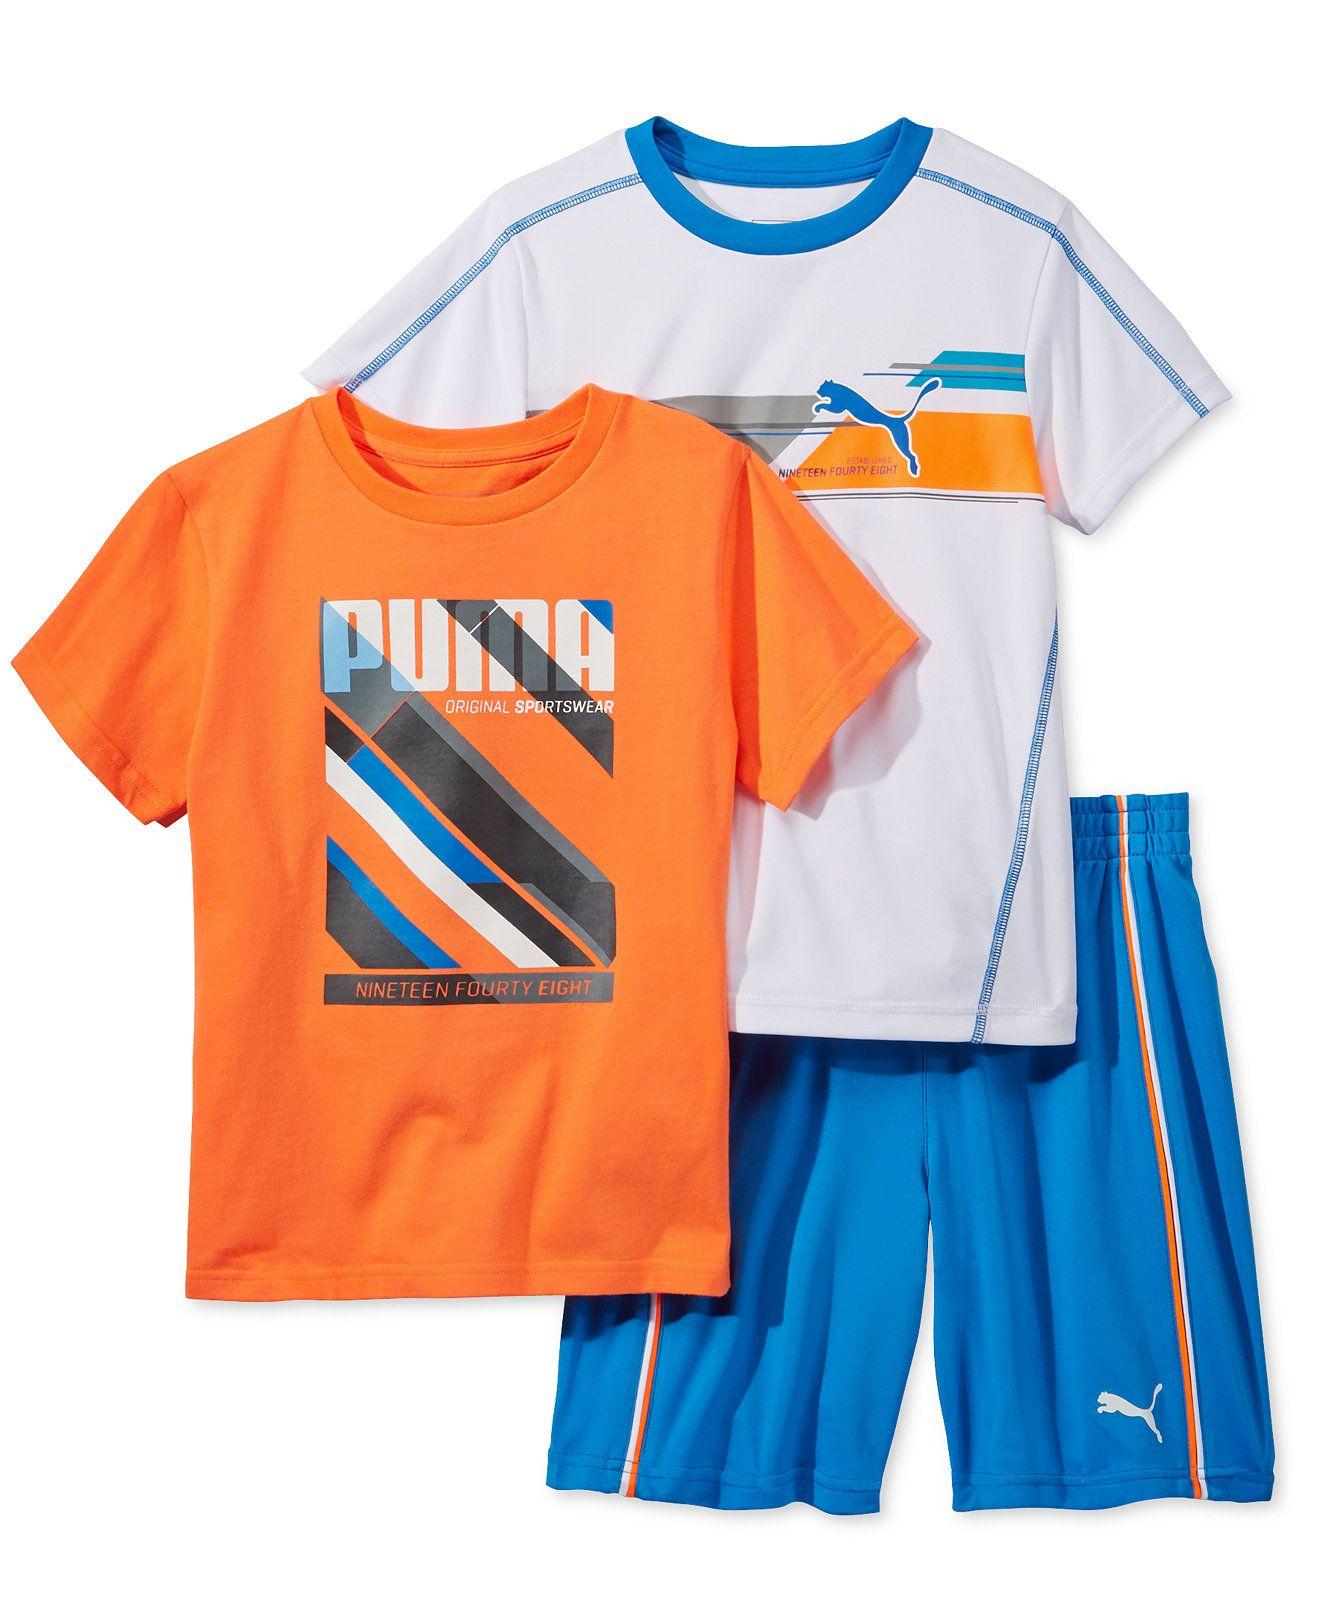 Puma Little Boys 3 Pc T Shirt Ringer T Shirt & Shorts Set Kids